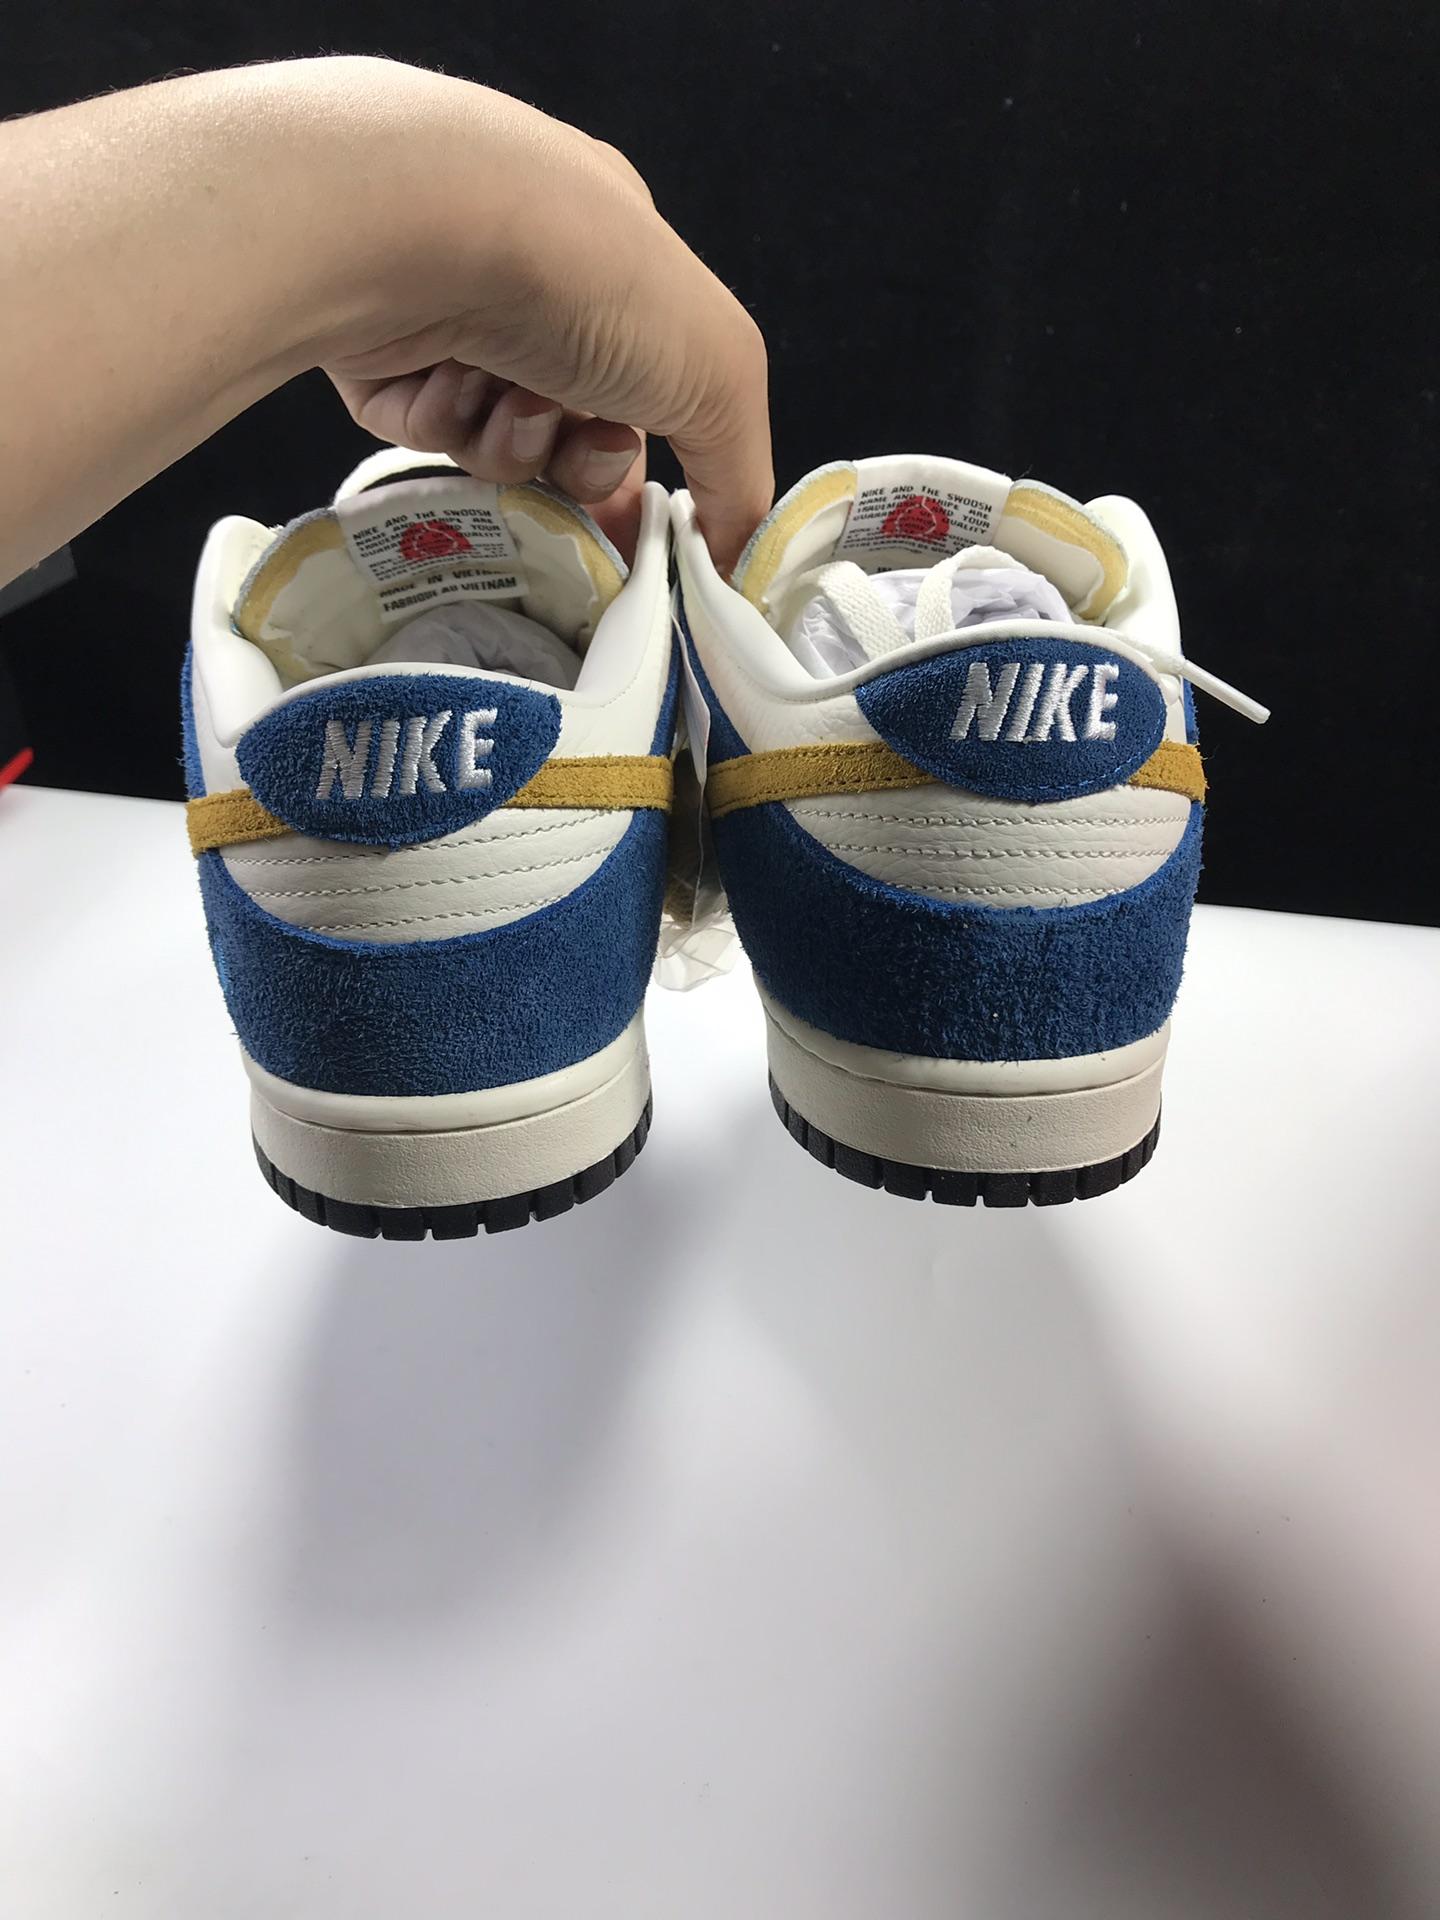 S2:DUNK涡轮蓝 NIKE Dunk LOW/KASINA,货号:CZ6501-100_ljr版本哪里买